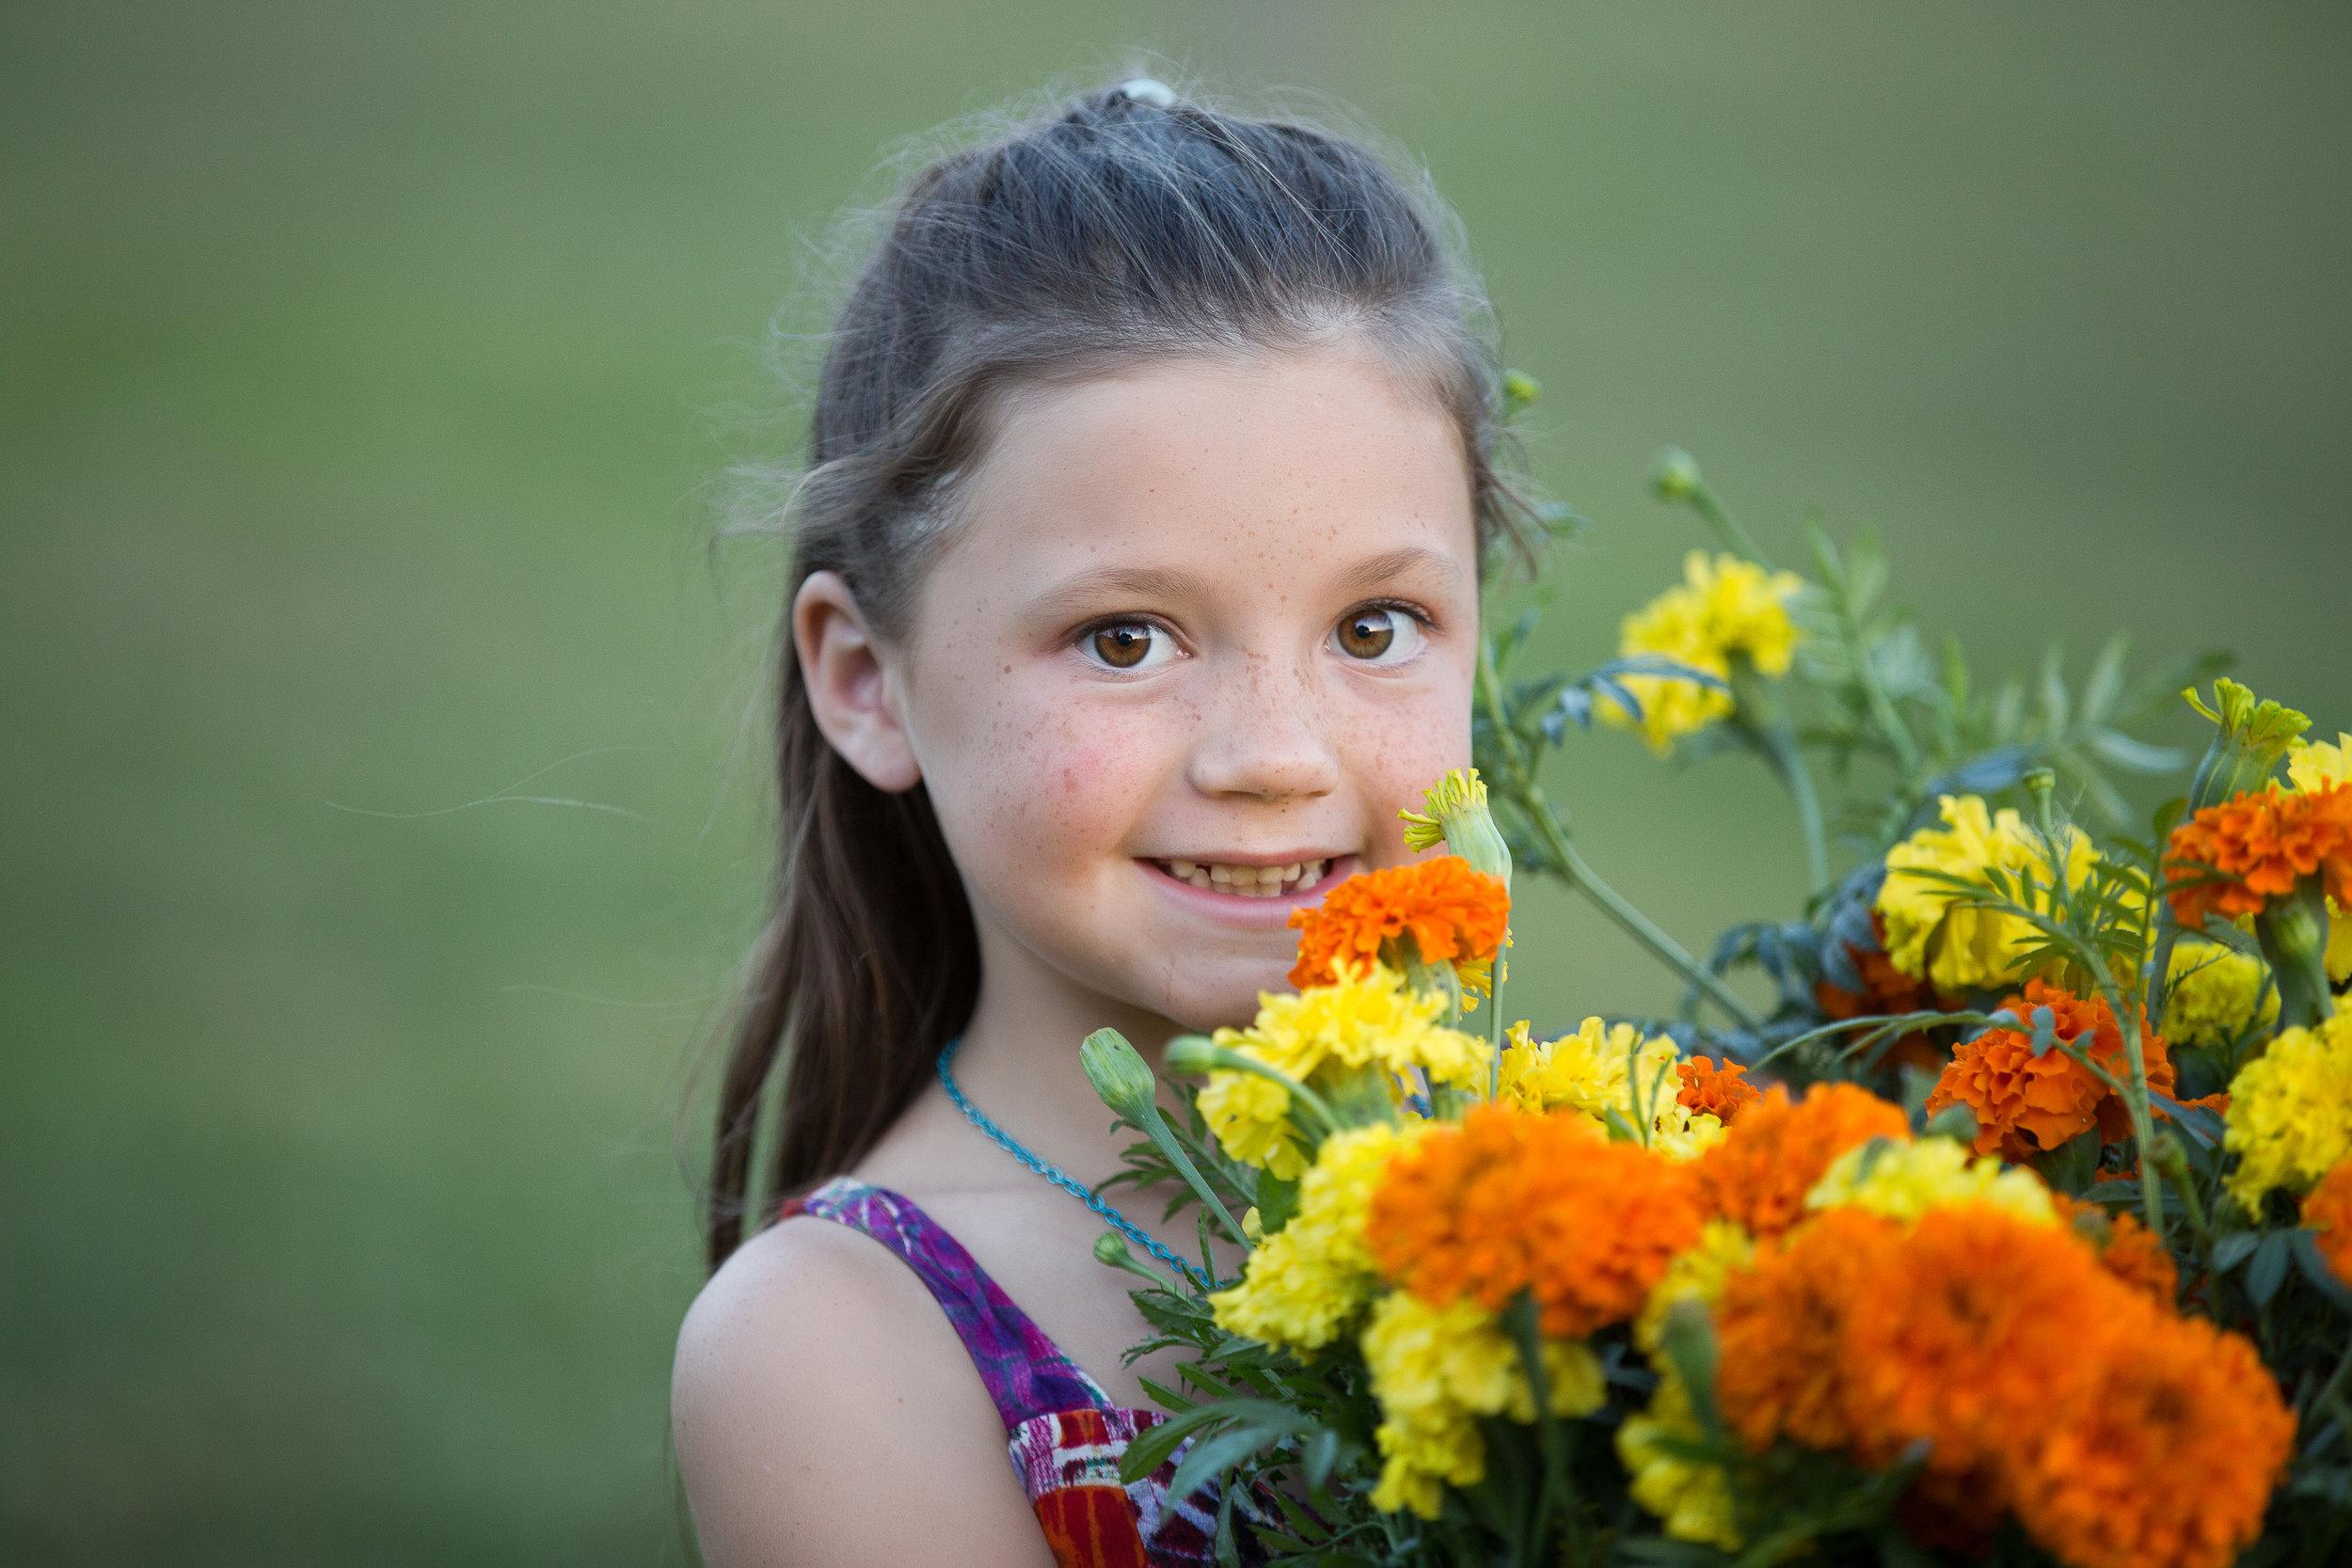 Kid holding organic marigolds grown on a local flower farm